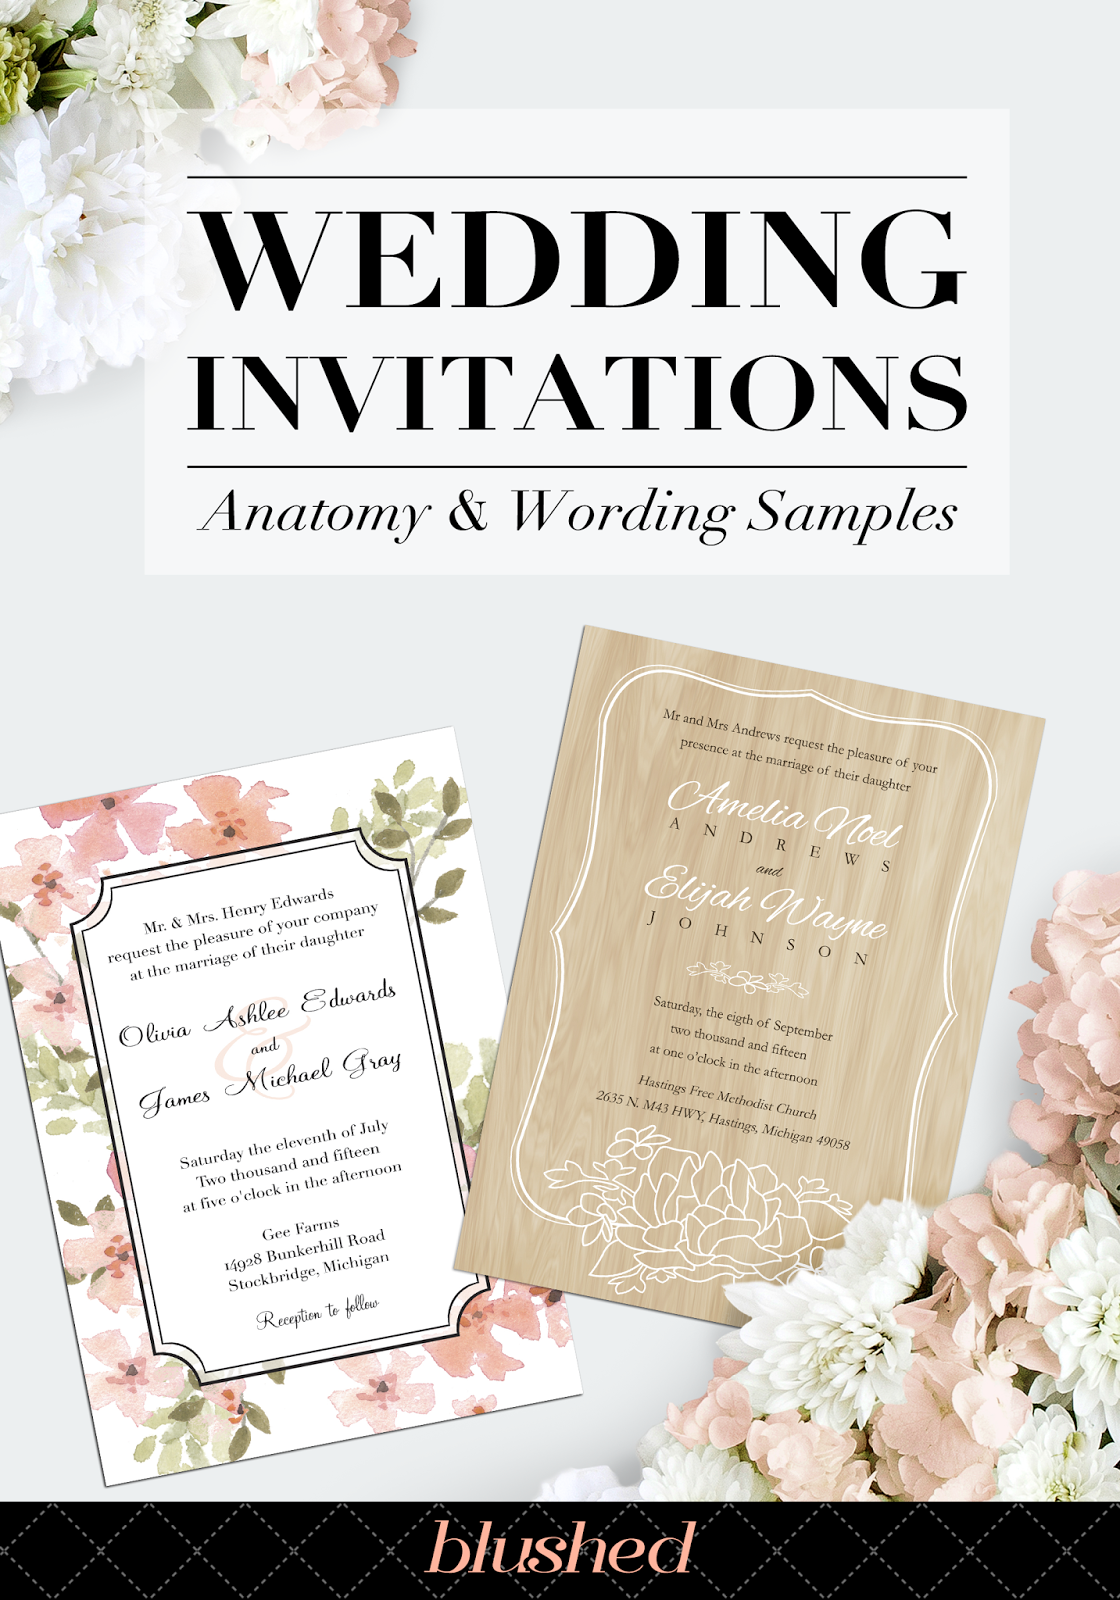 Katrina: Wedding Etiquette: Invitation Wording